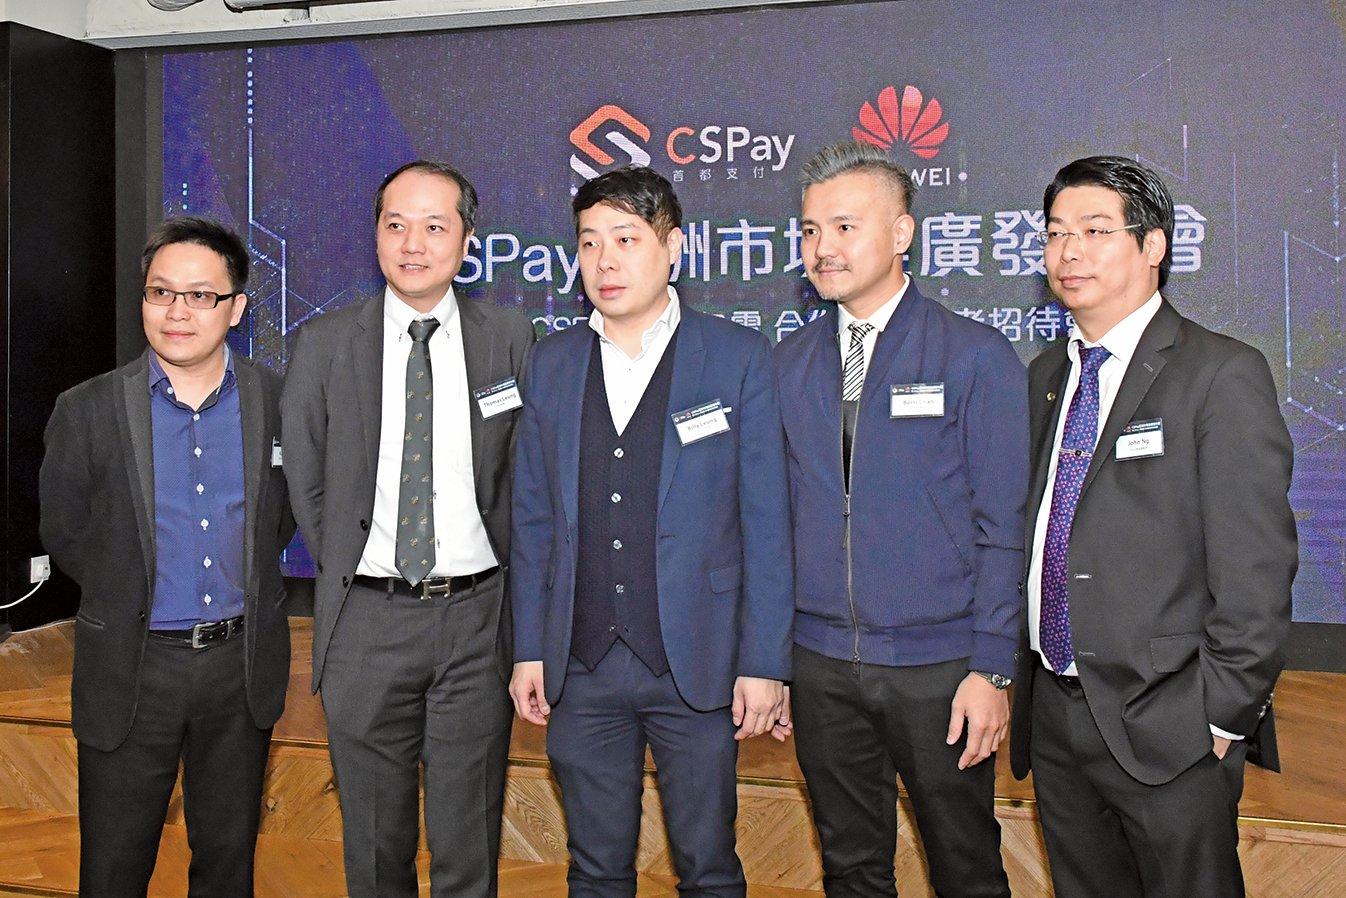 CSPay創辦人梁衛漢(左2)、華為雲市場發展總監何啟祥(左1)。(郭威利/大紀元)